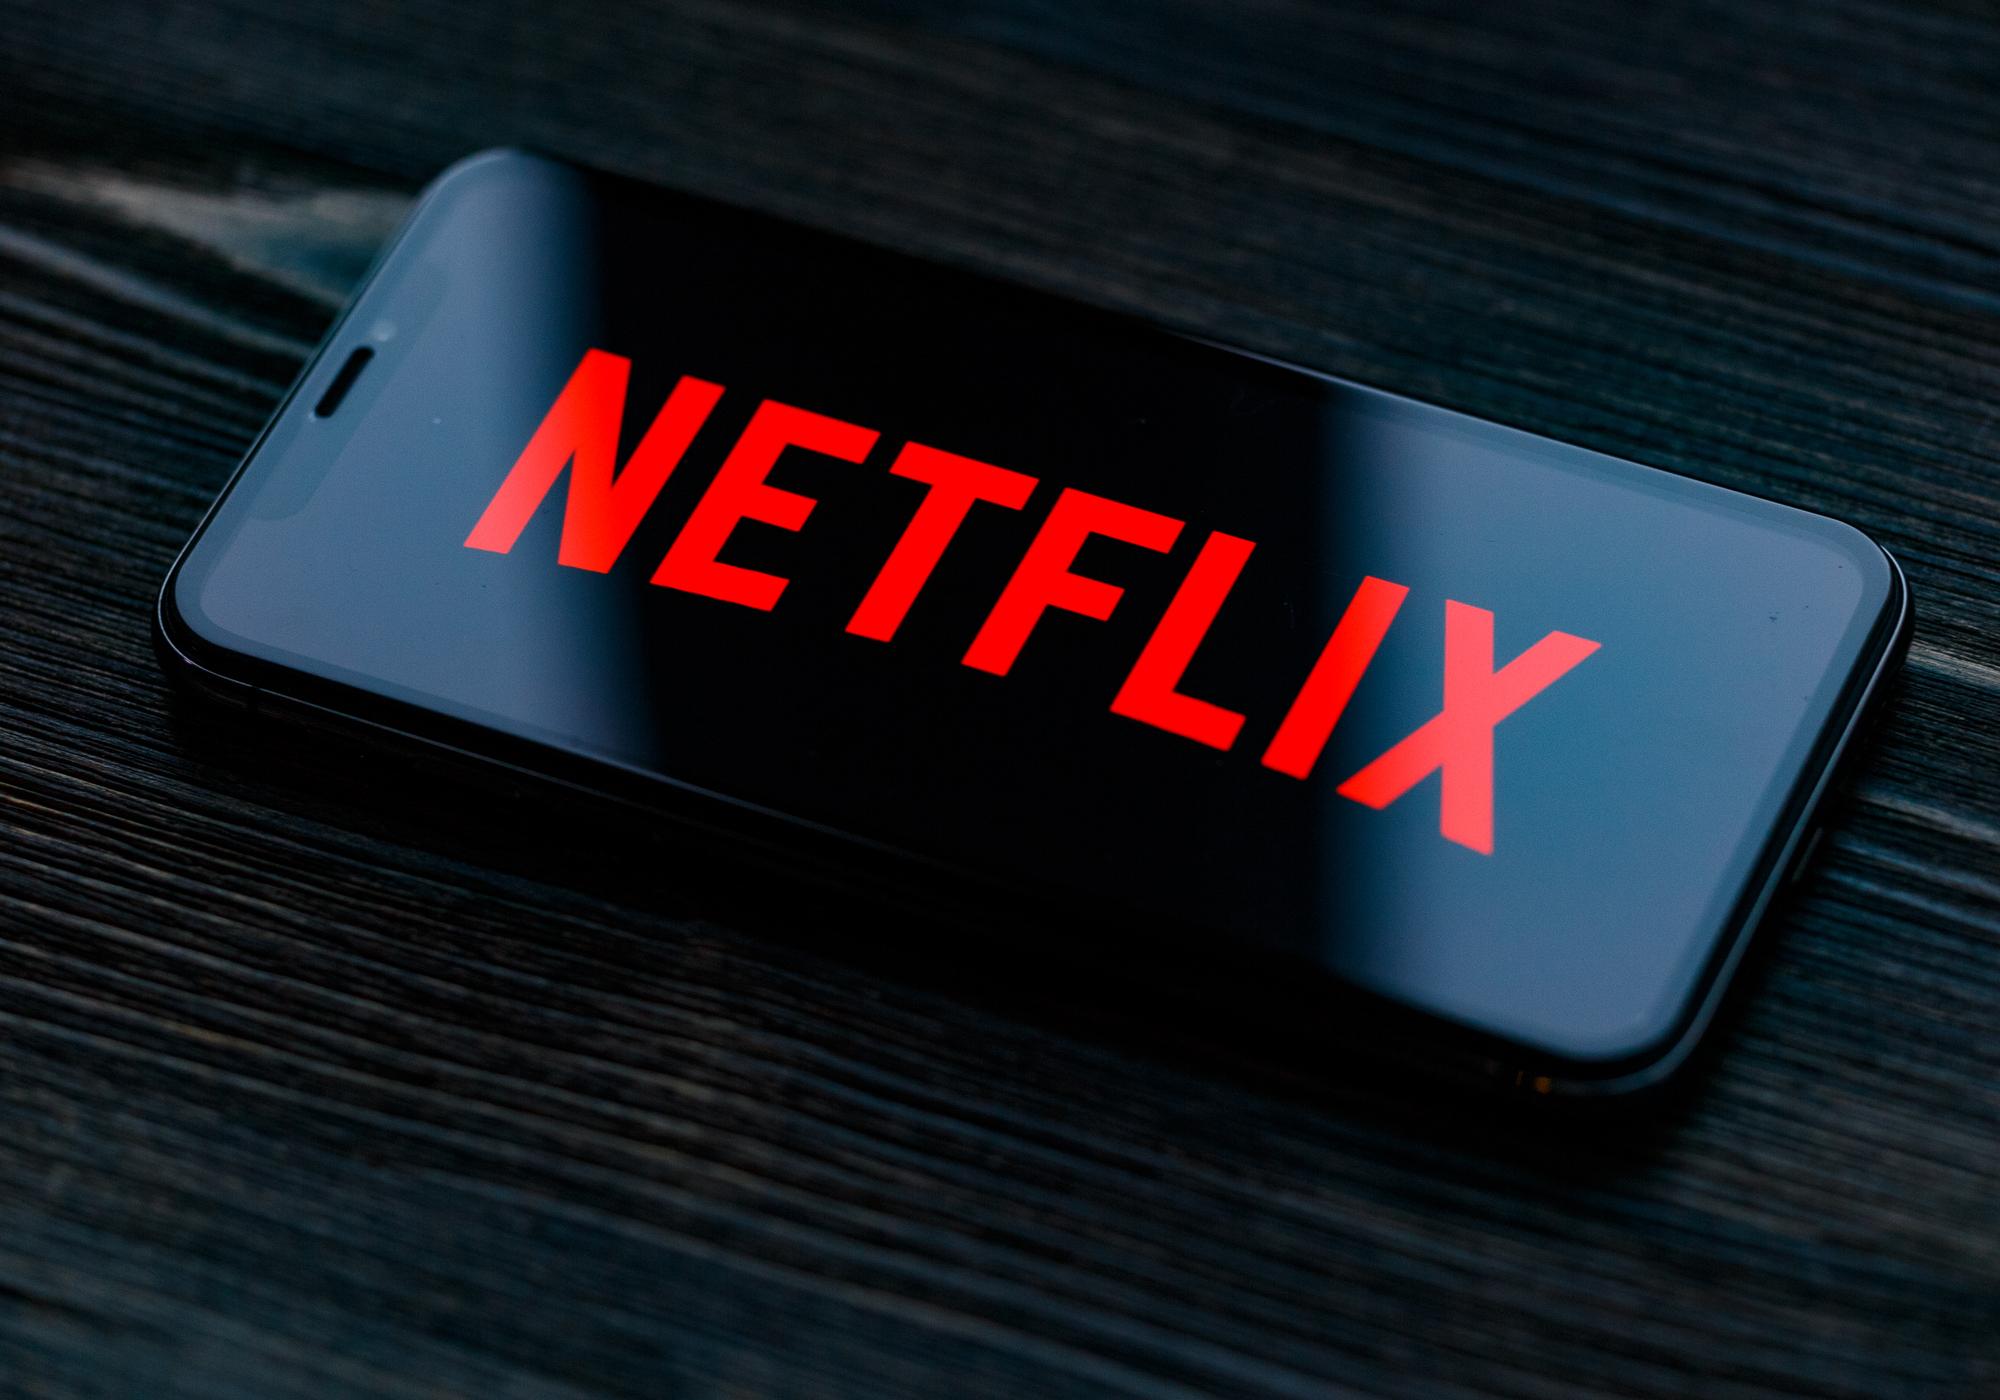 Netflix adds 15.8 million subscribers in lockdown surge